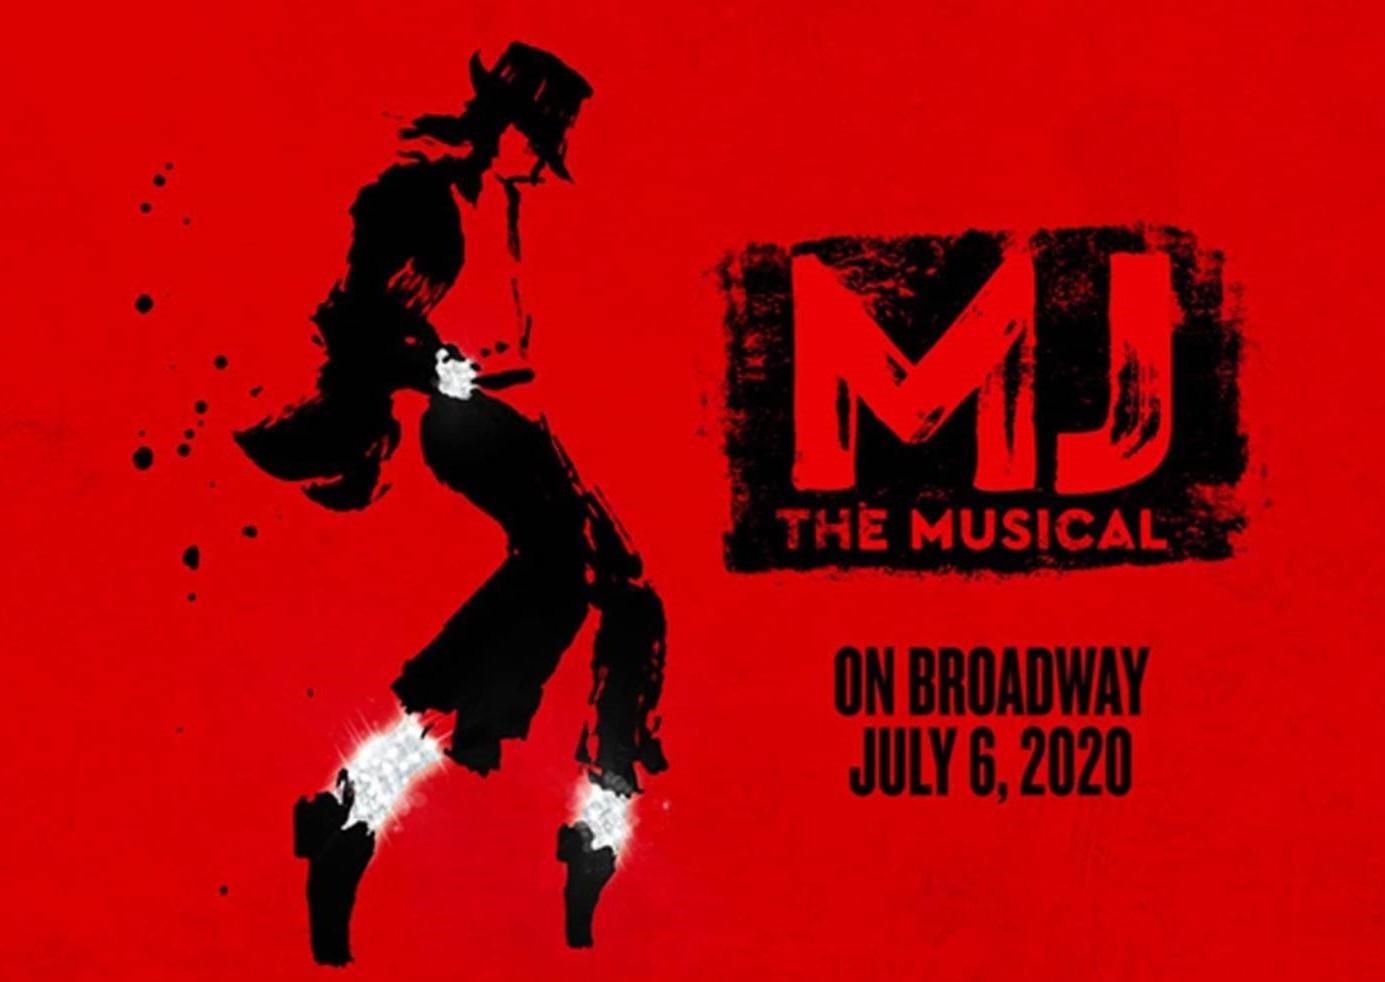 【 MJ the Musical 】 ブロ−ドウェイ ミュージカル チケット 2020年7月6日上演開始!